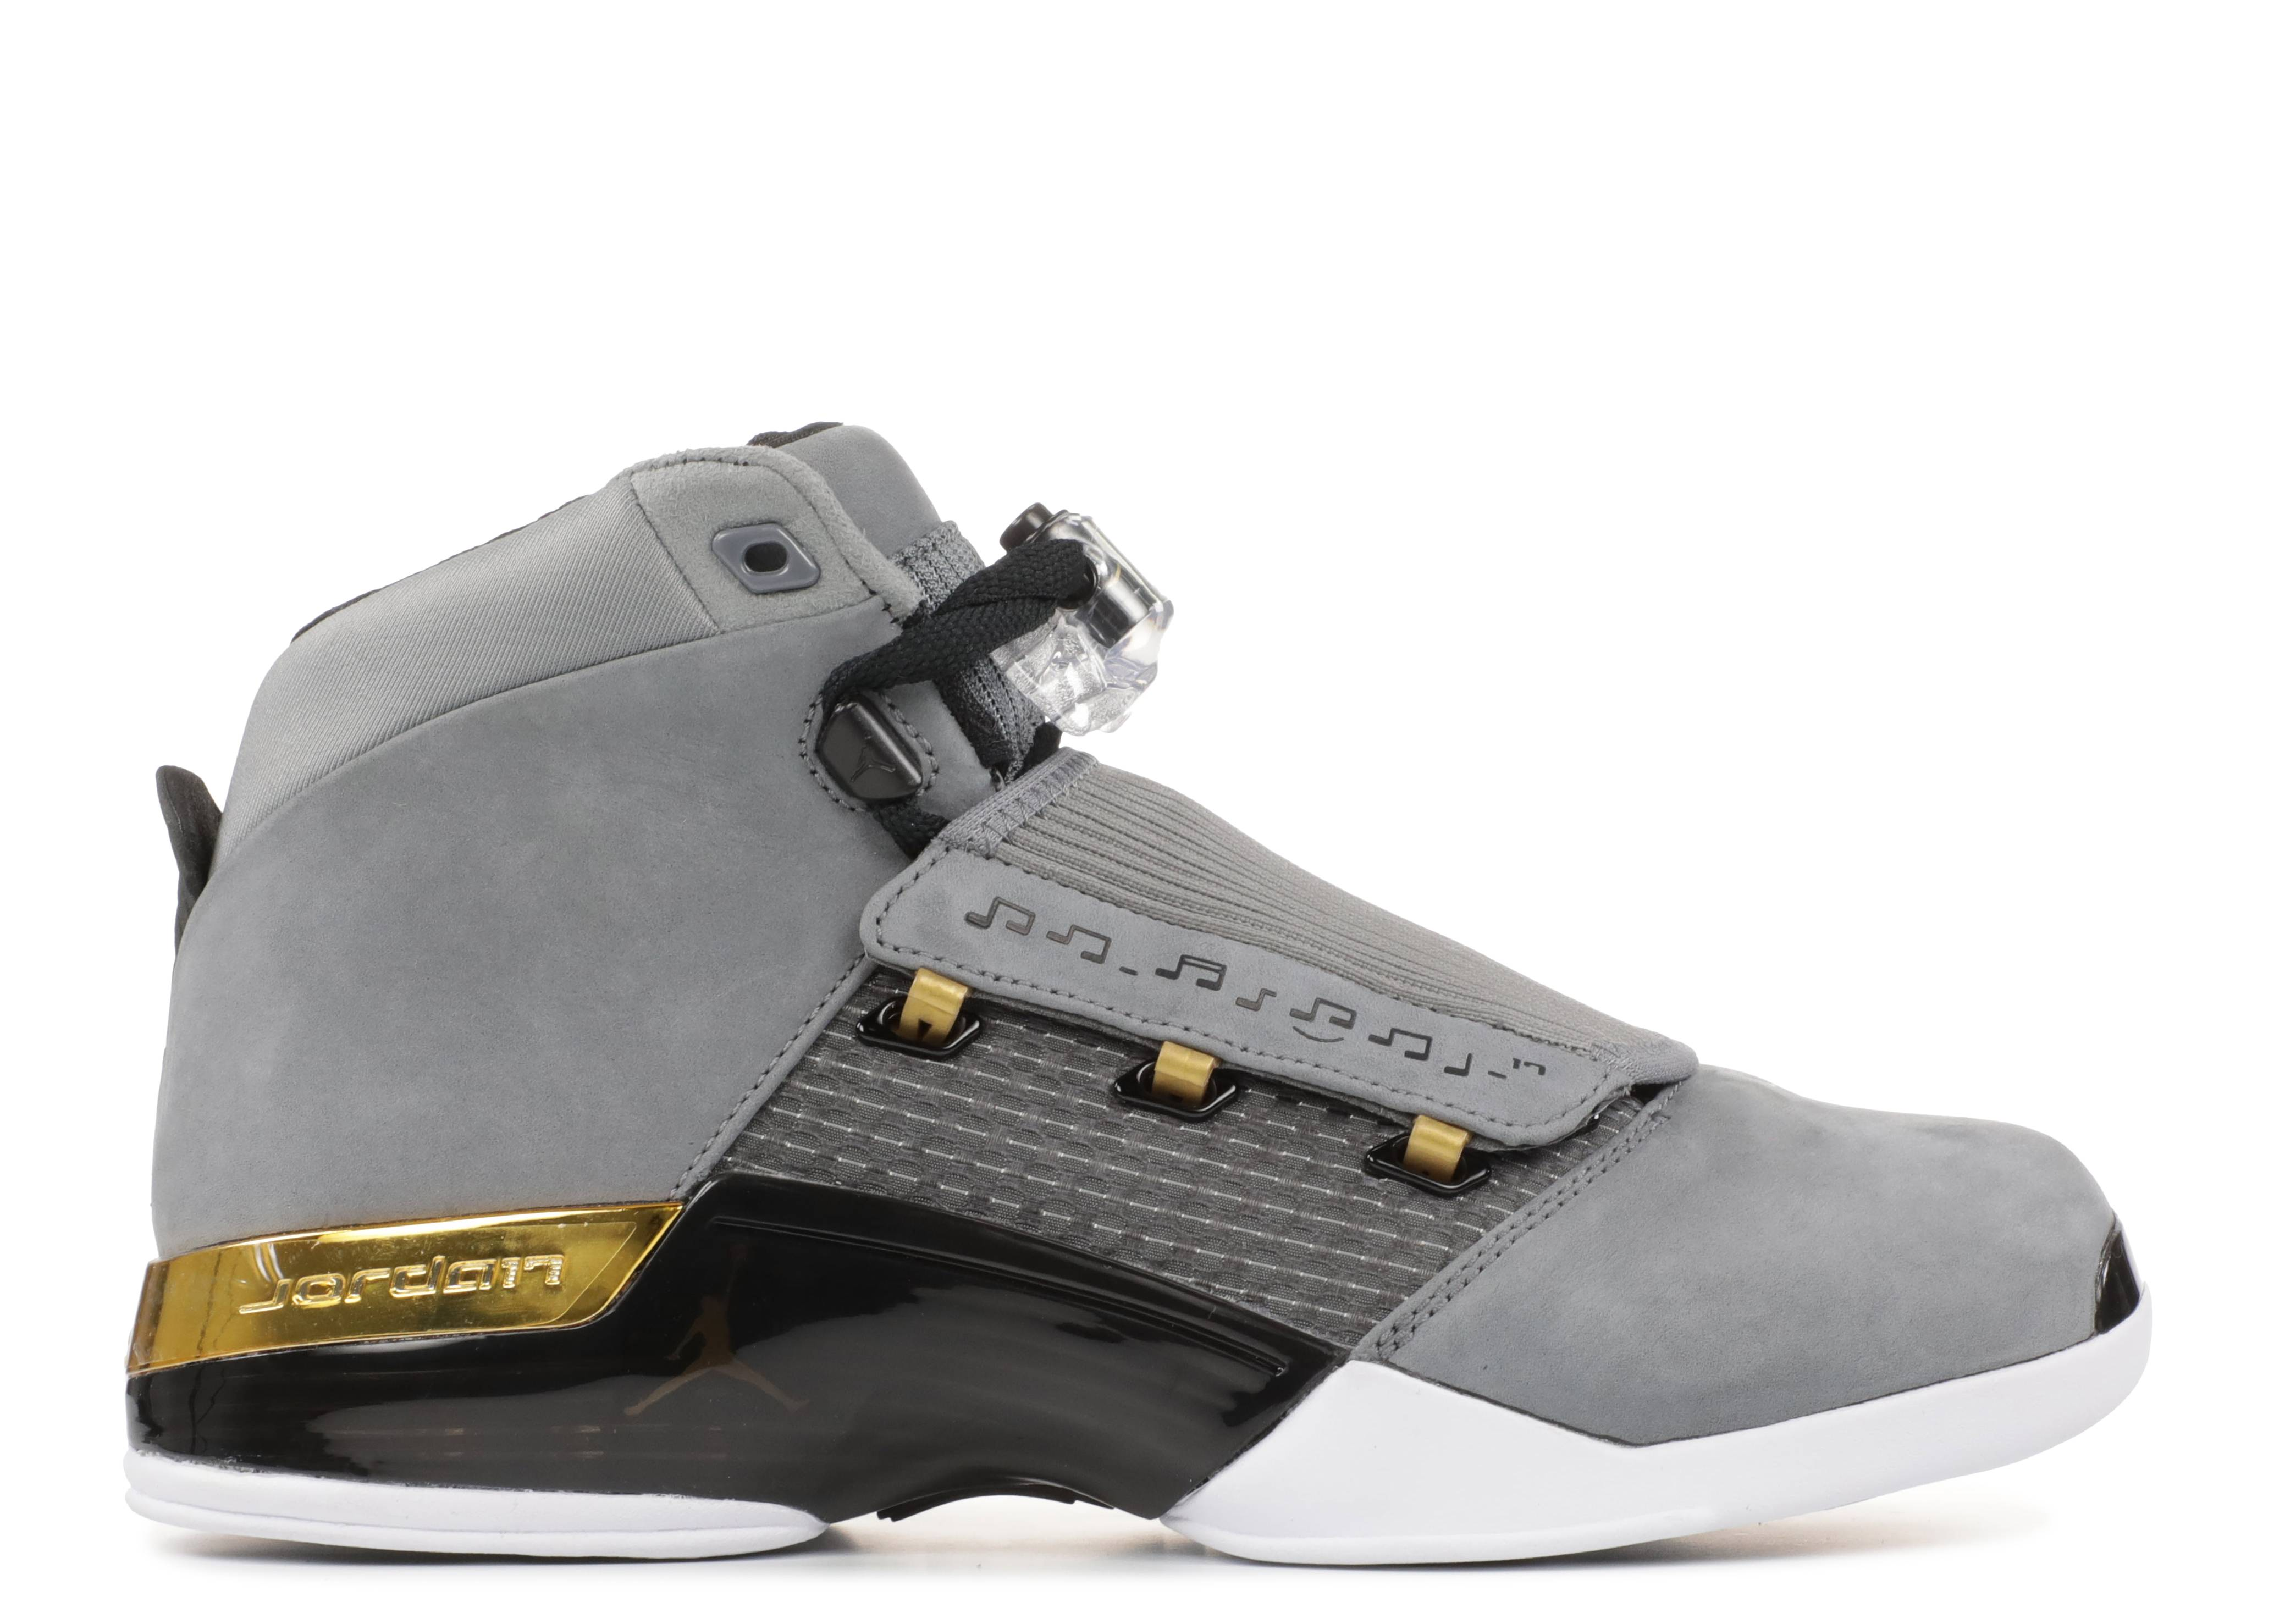 Air Jordan 17 (XVII) Shoes - Nike  1b2bdc8a0